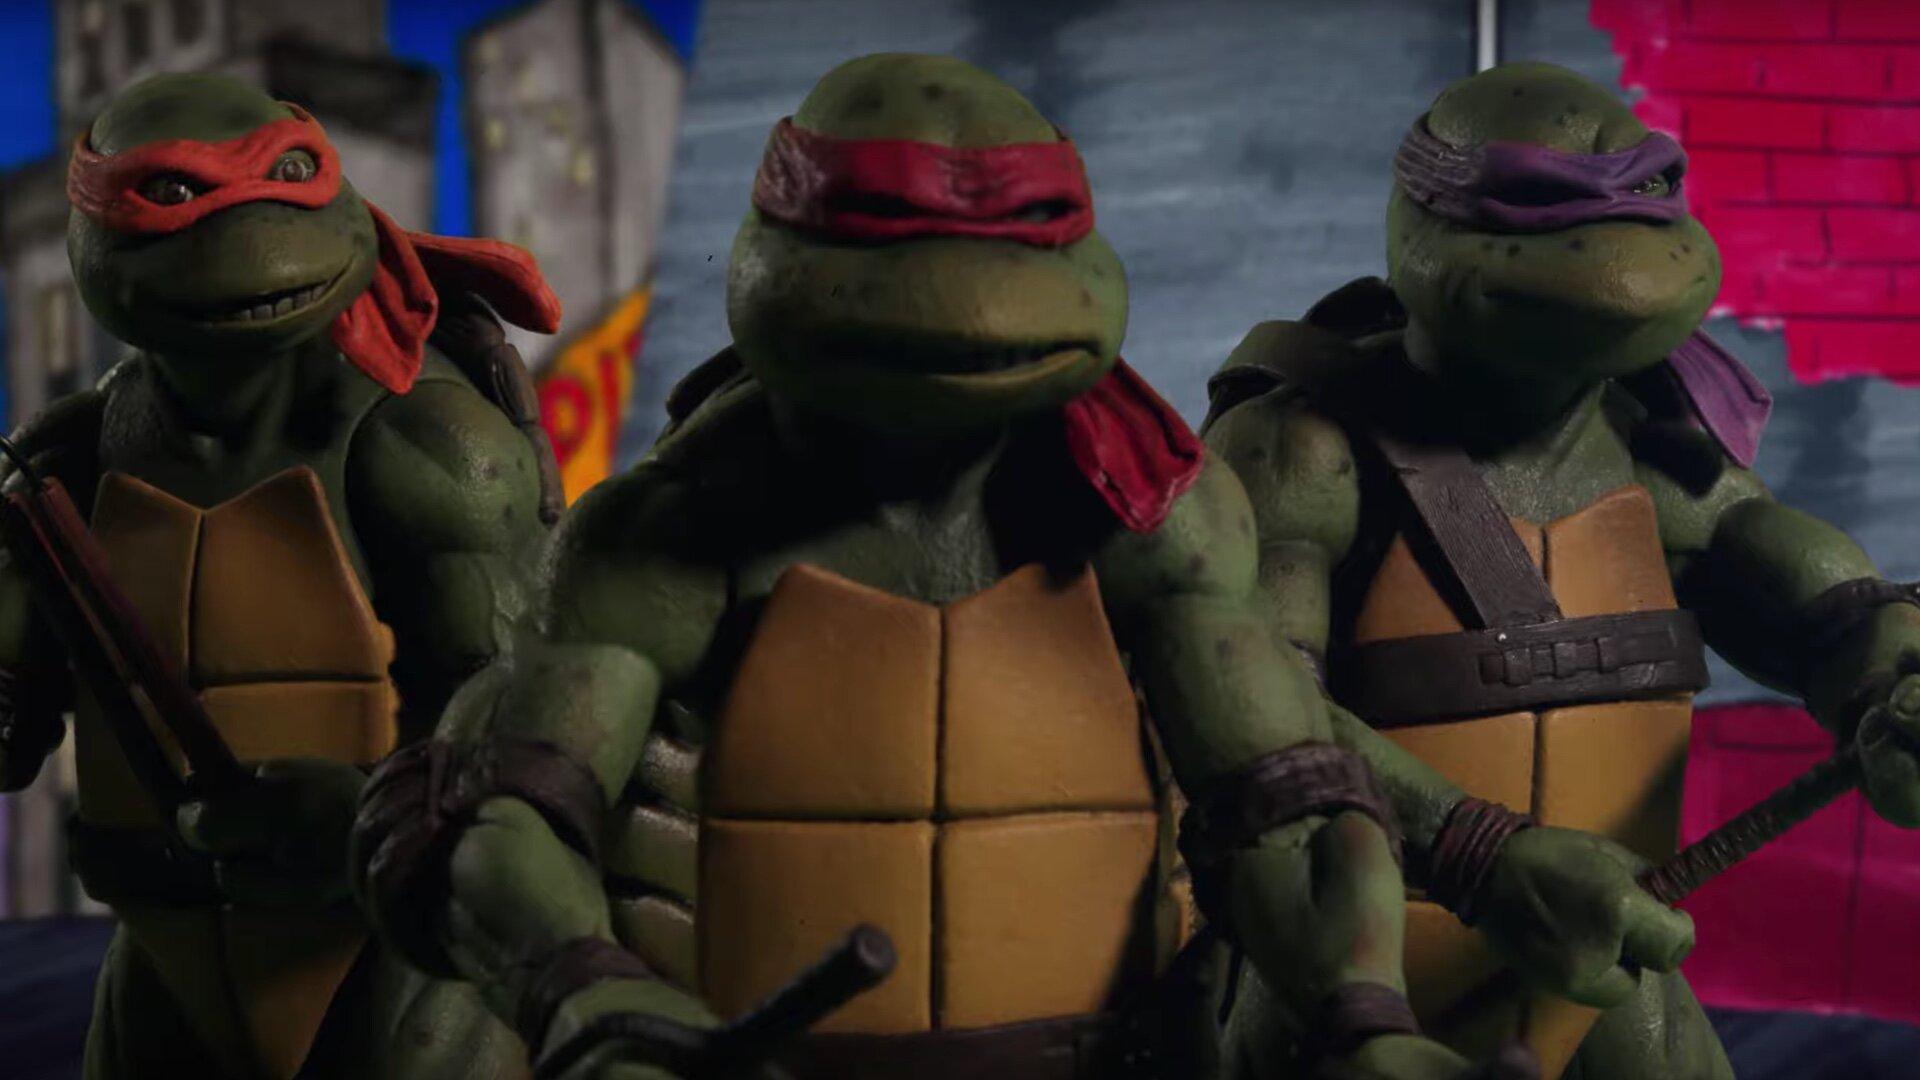 The Original Trailer For The 1990s Teenage Mutant Ninja Turtles